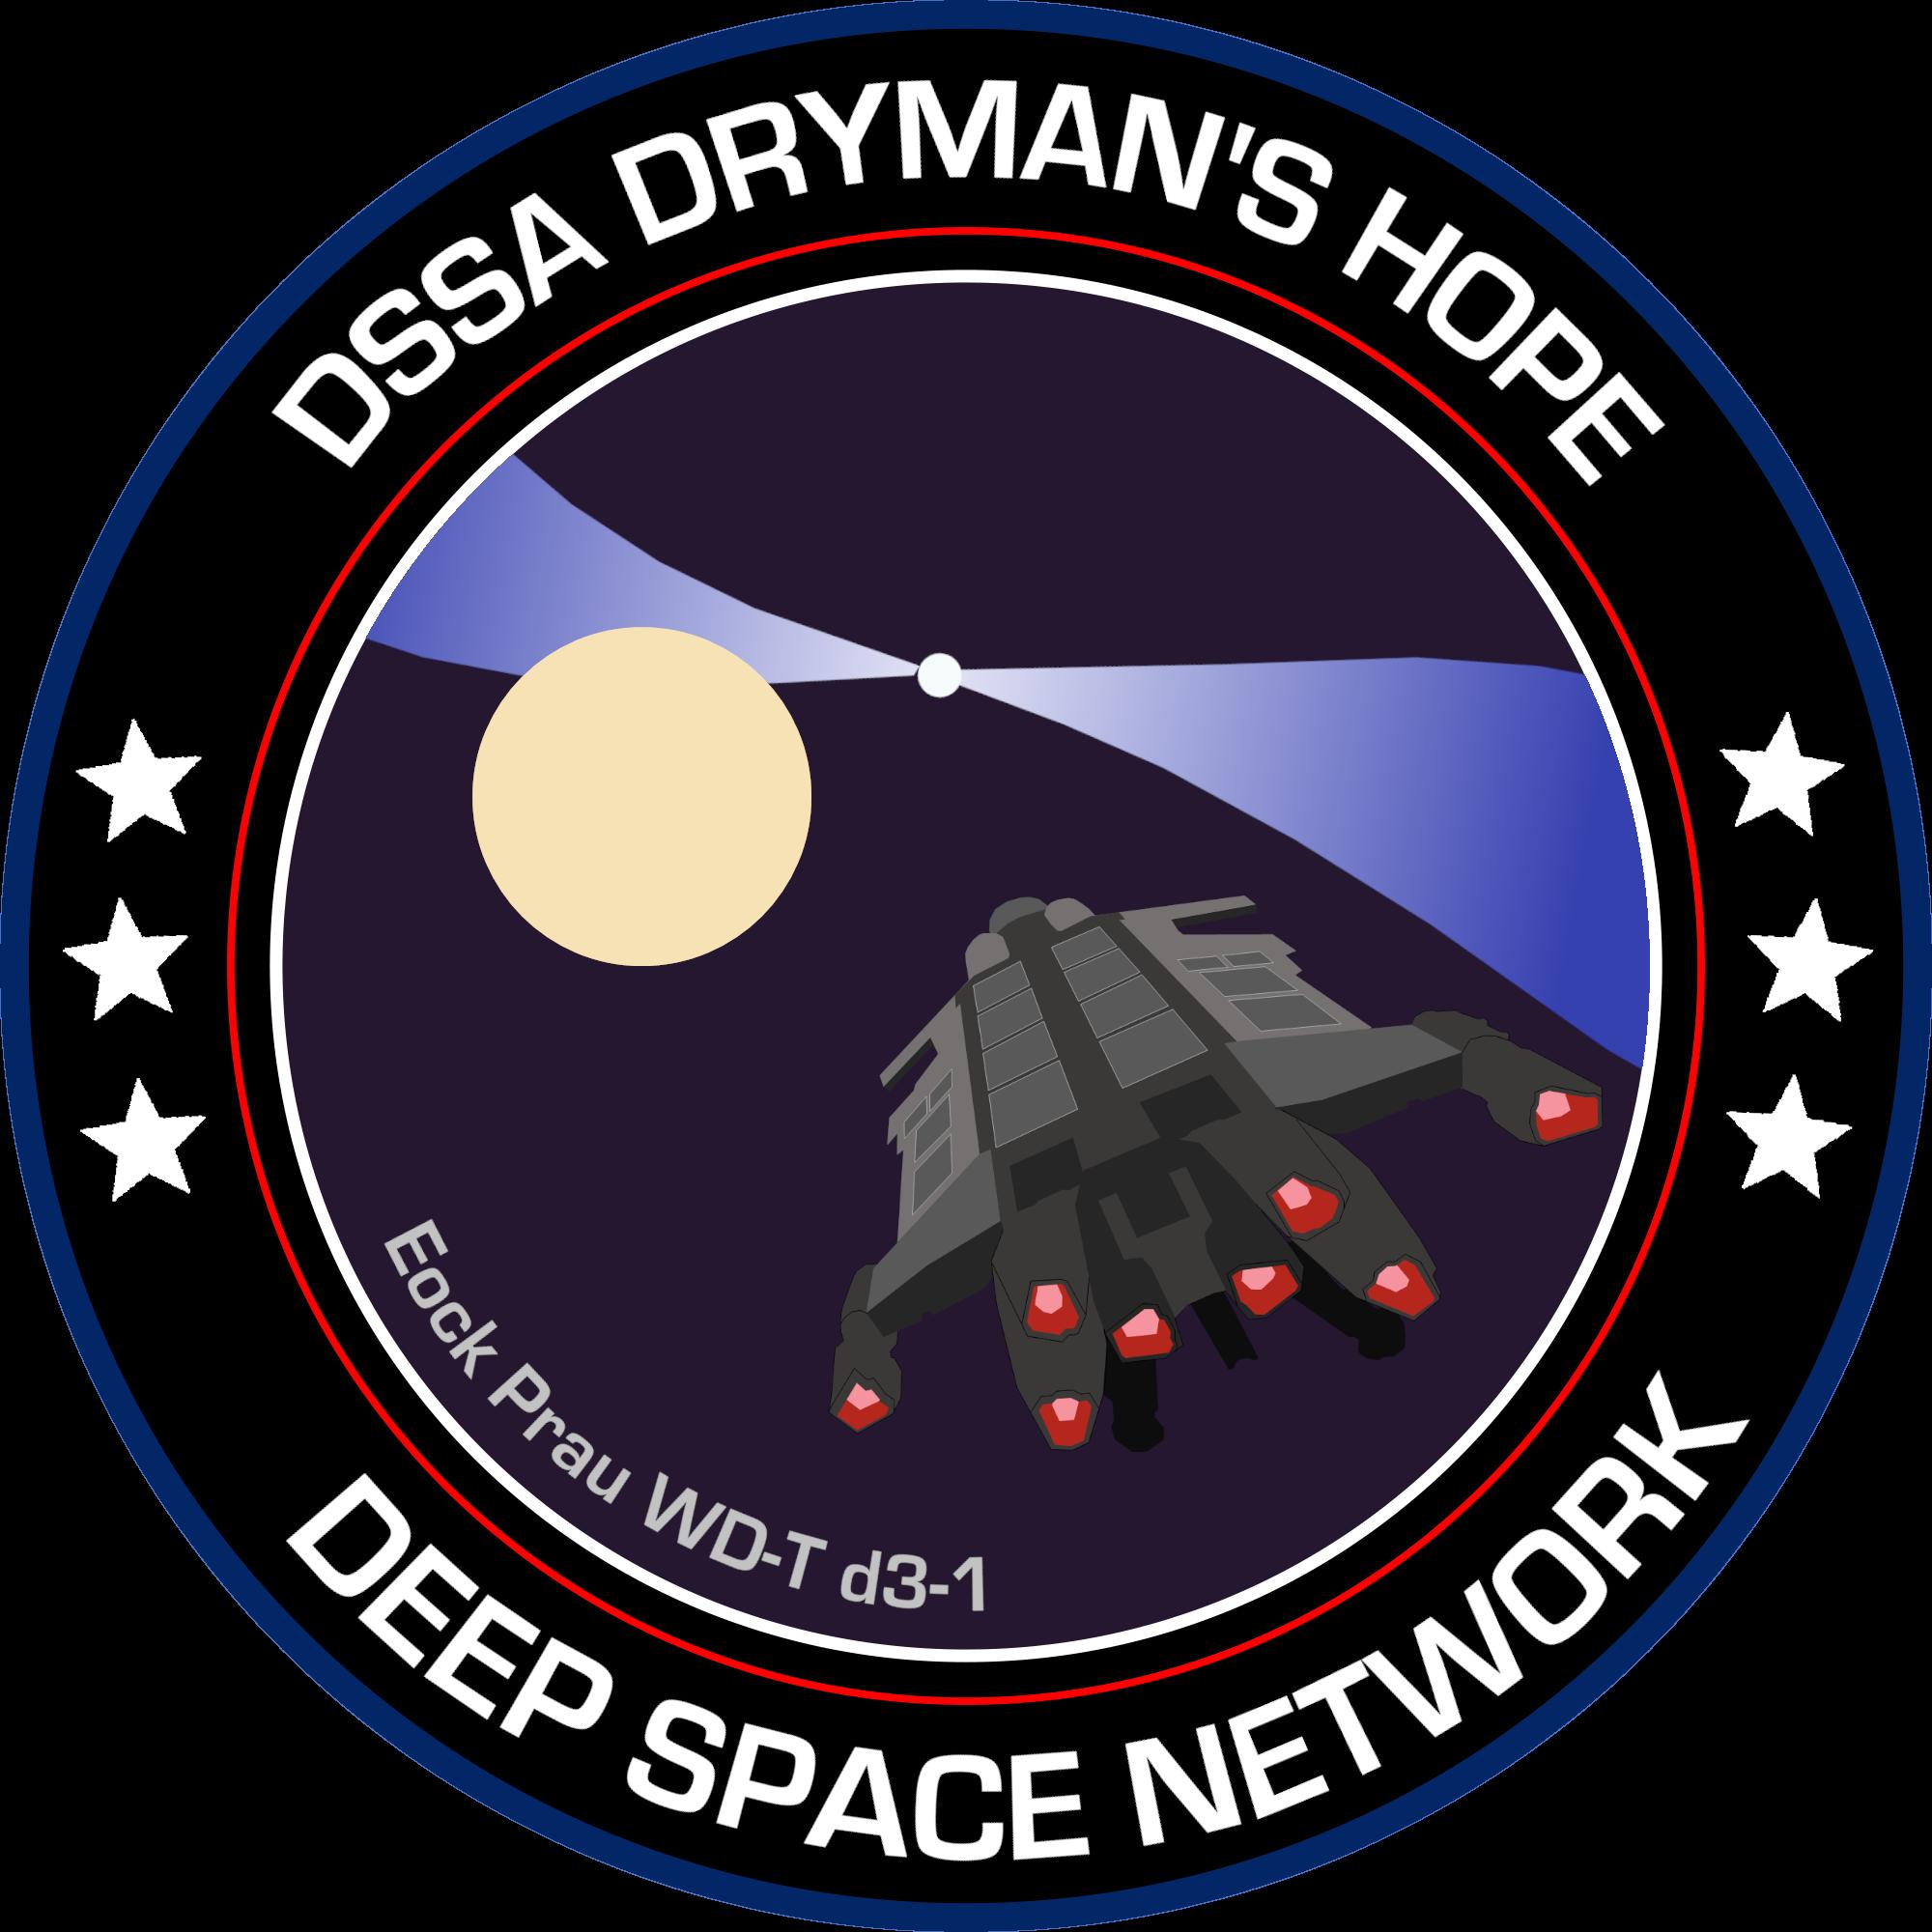 logo_DSSA_DrymansHope.png